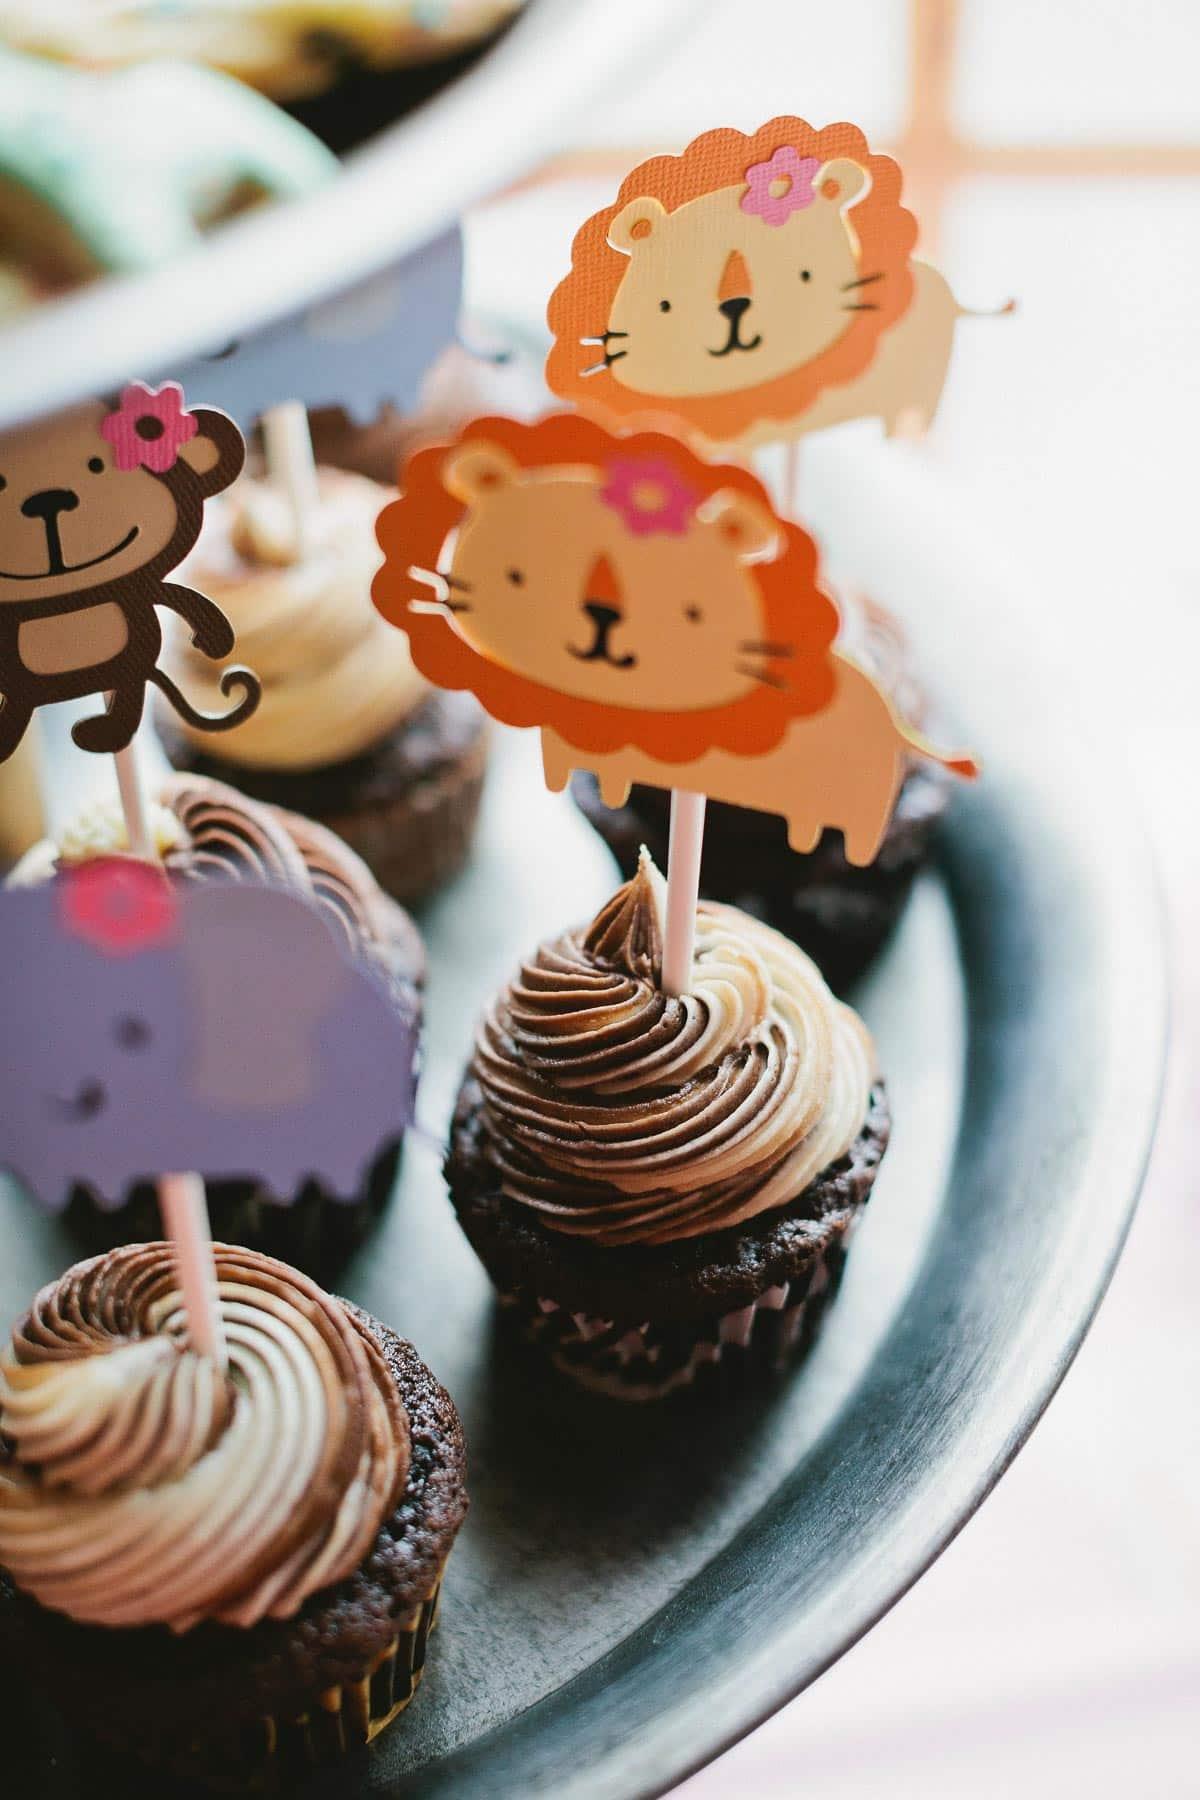 Chocolate and vanilla swirl cupcakes for 1st birthday party on sallysbakingaddiction.com